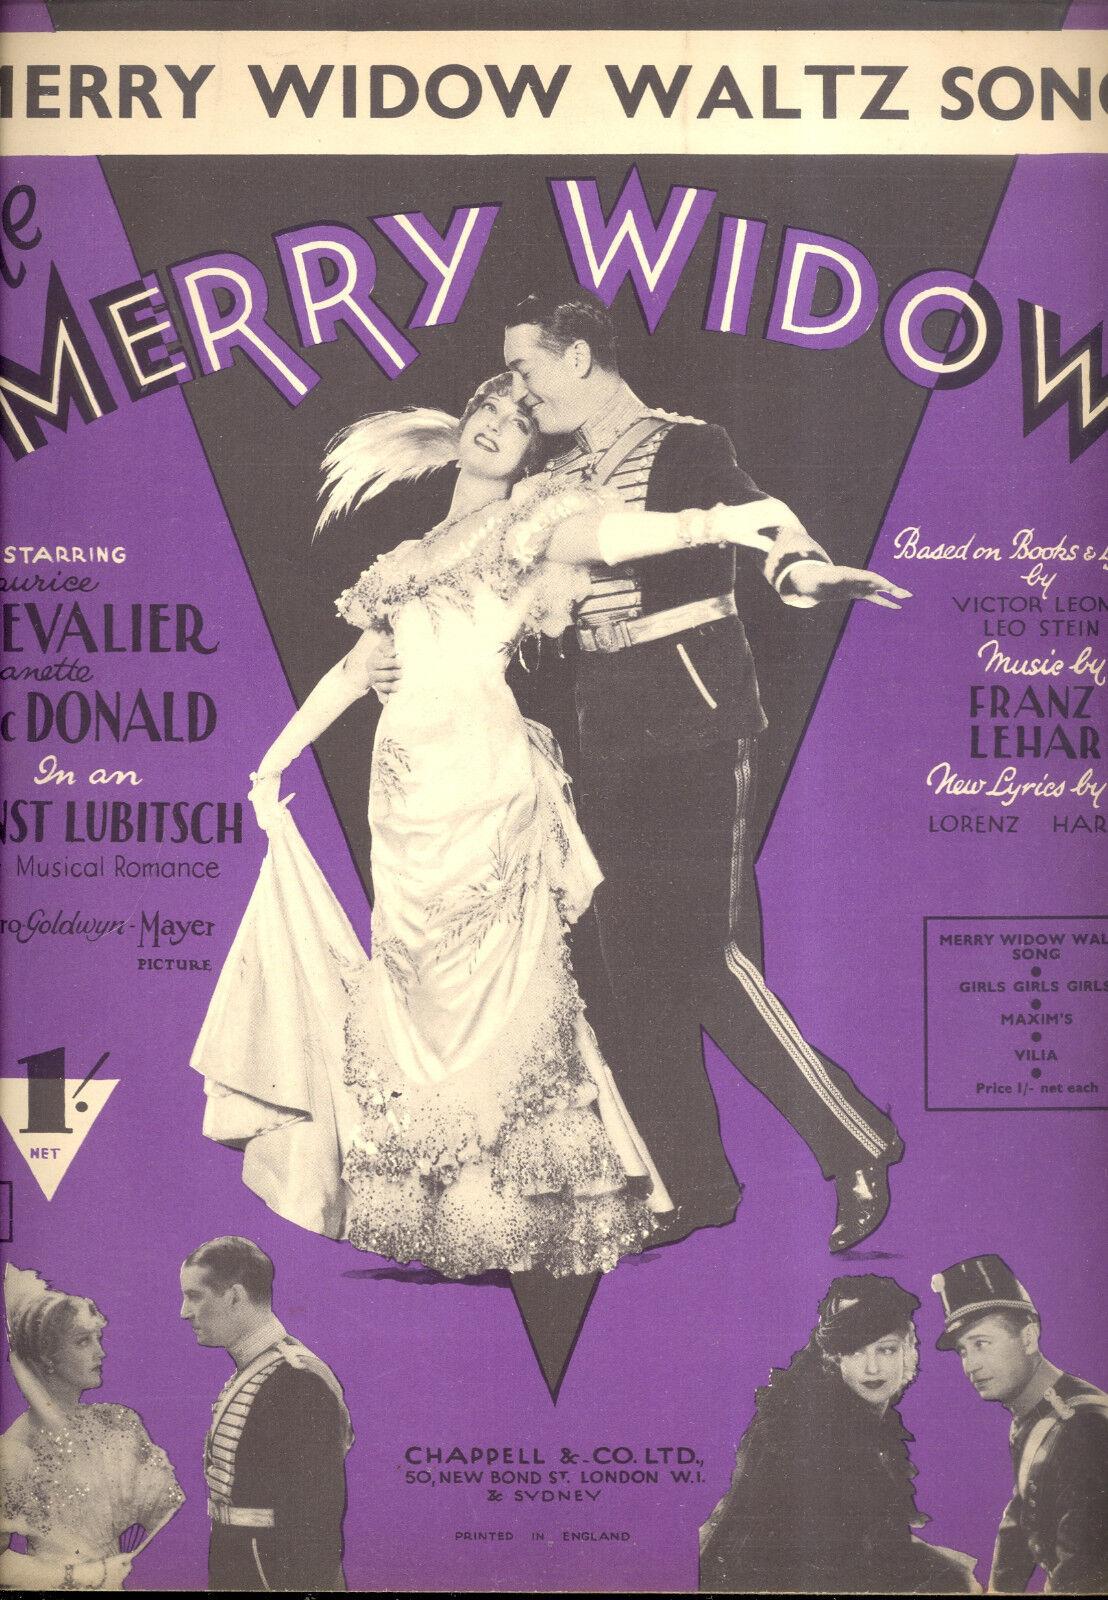 Merry Widow Notenblatt   Merry Widow Waltz Lied   Jeanette Macdonald Britischer